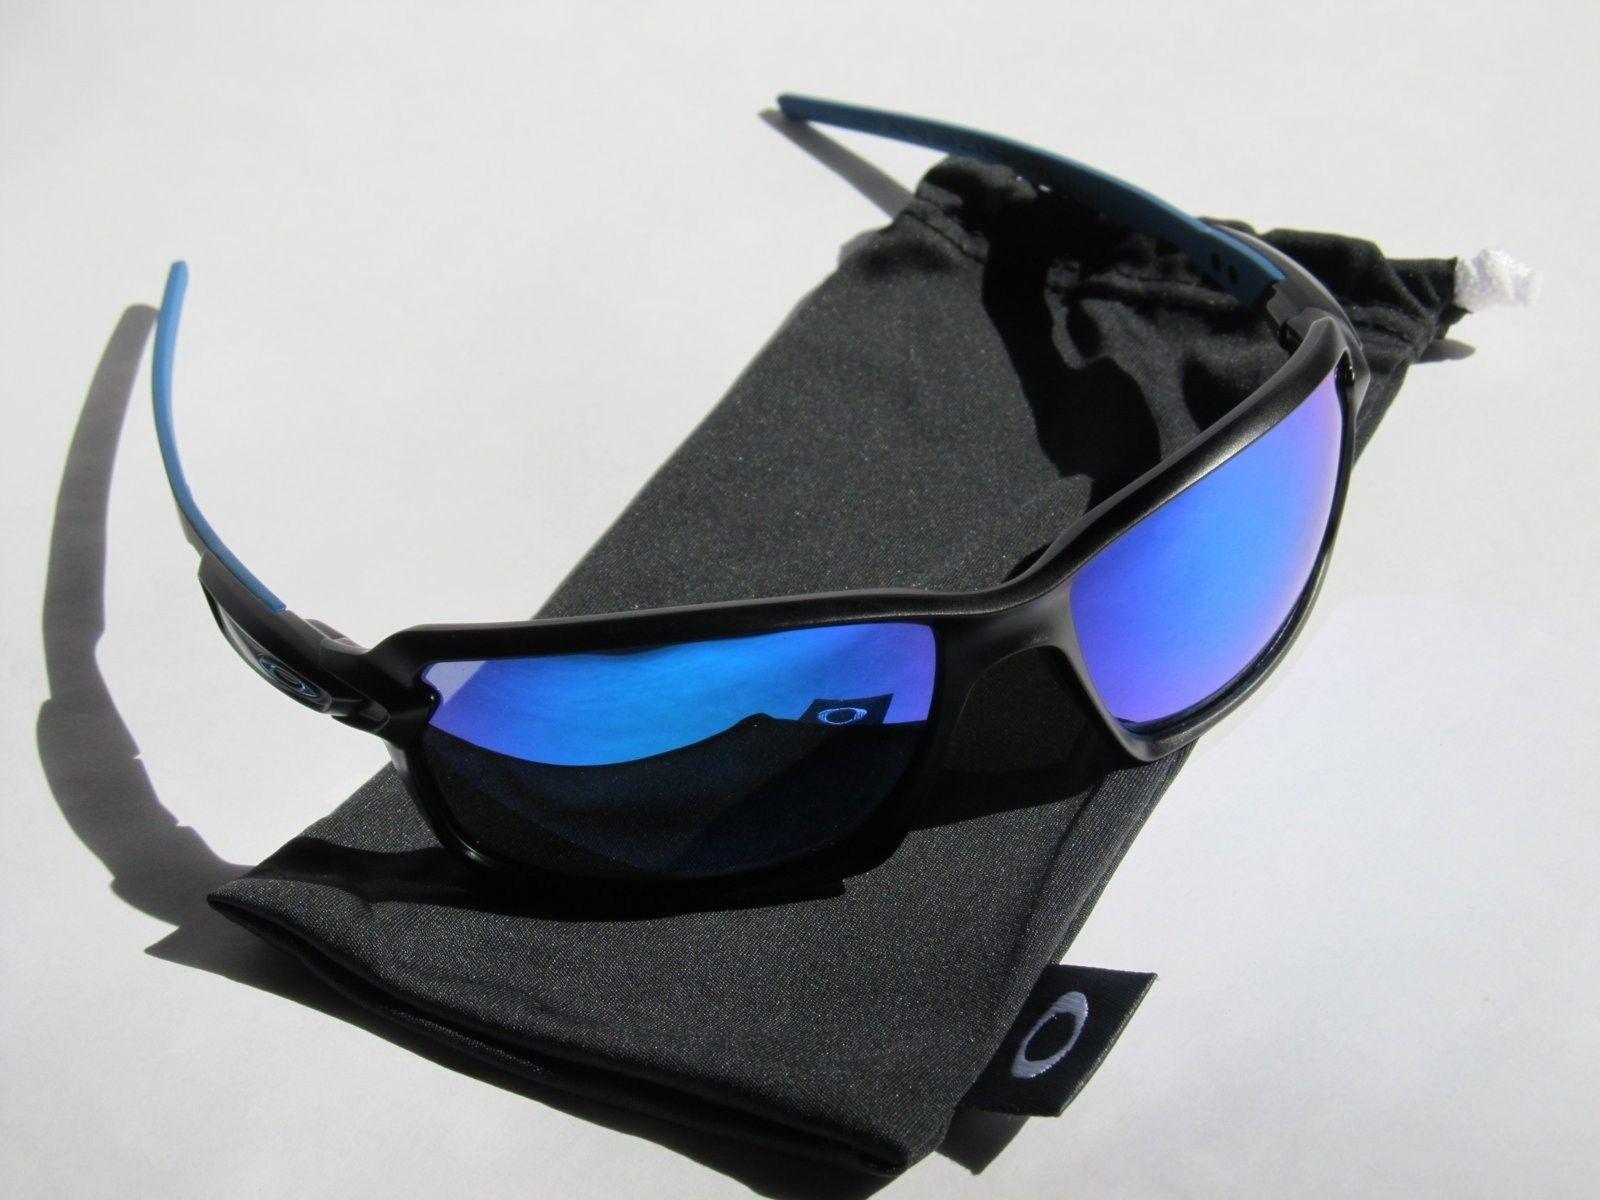 OAKLEY CARBON SHIFT MATTE BLACK Sapphire Iridium - OO9302-02 - IMG_0439.JPG